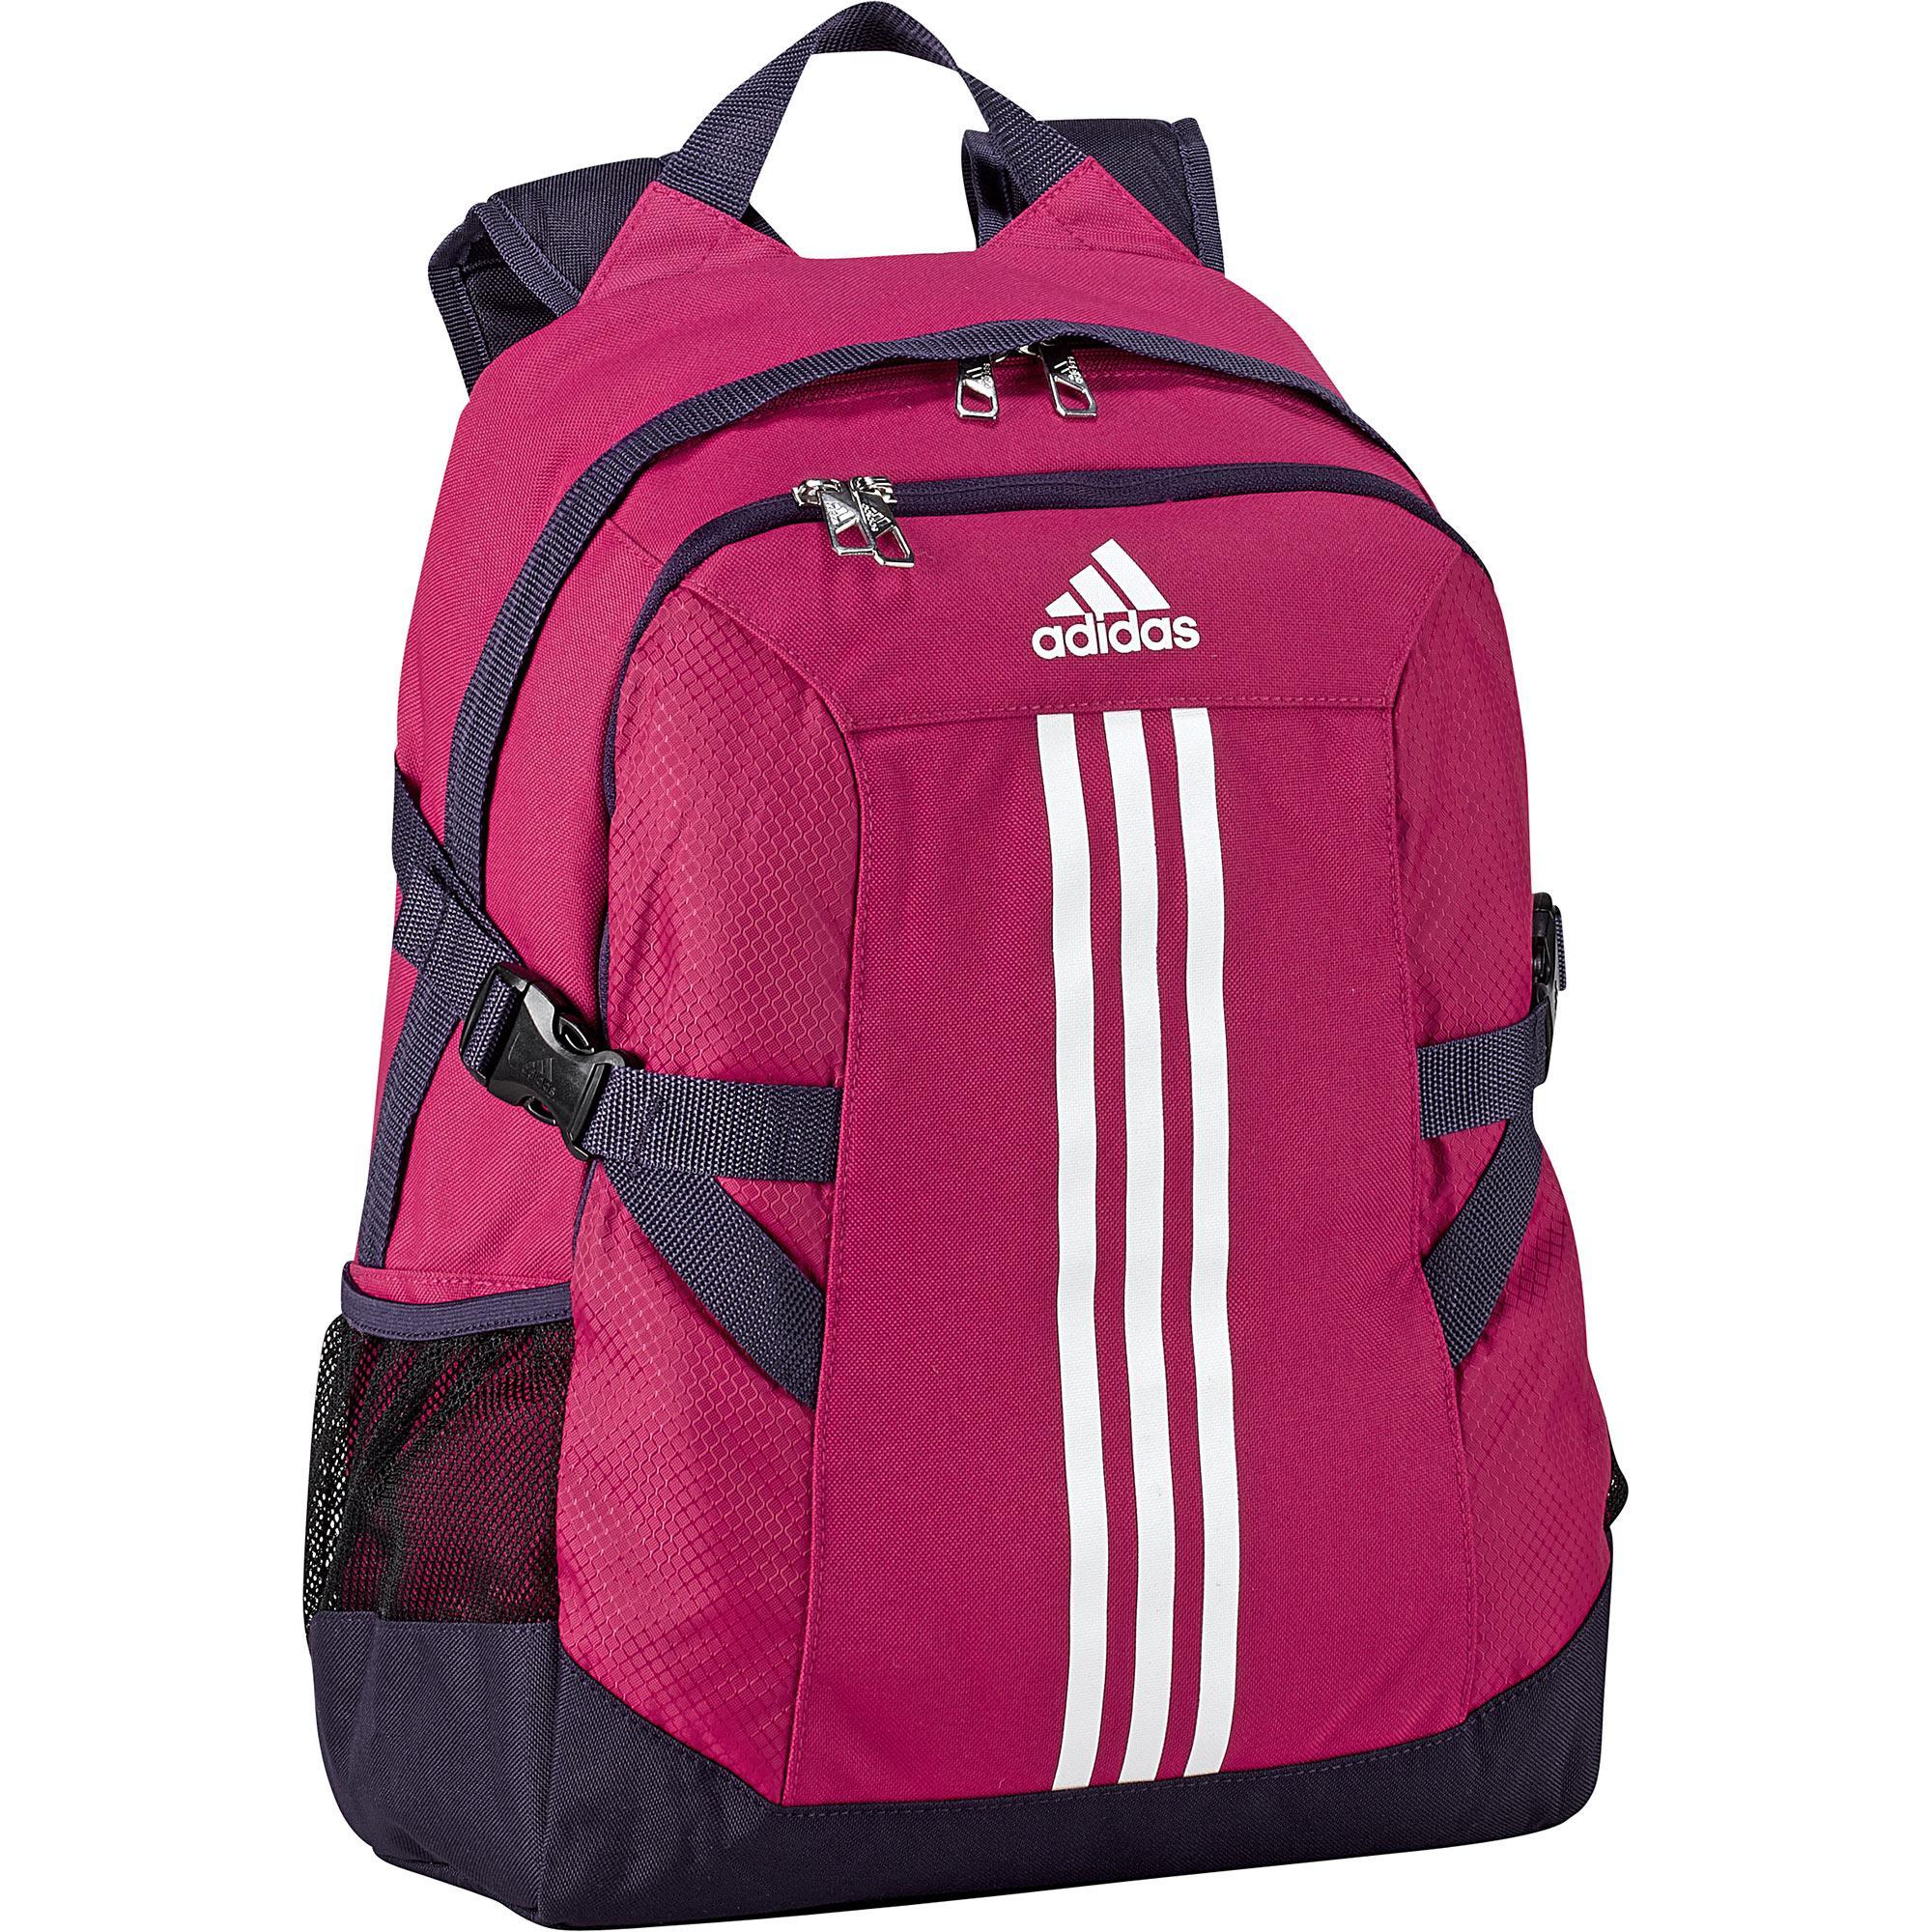 adidas power ii backpack berry pink. Black Bedroom Furniture Sets. Home Design Ideas